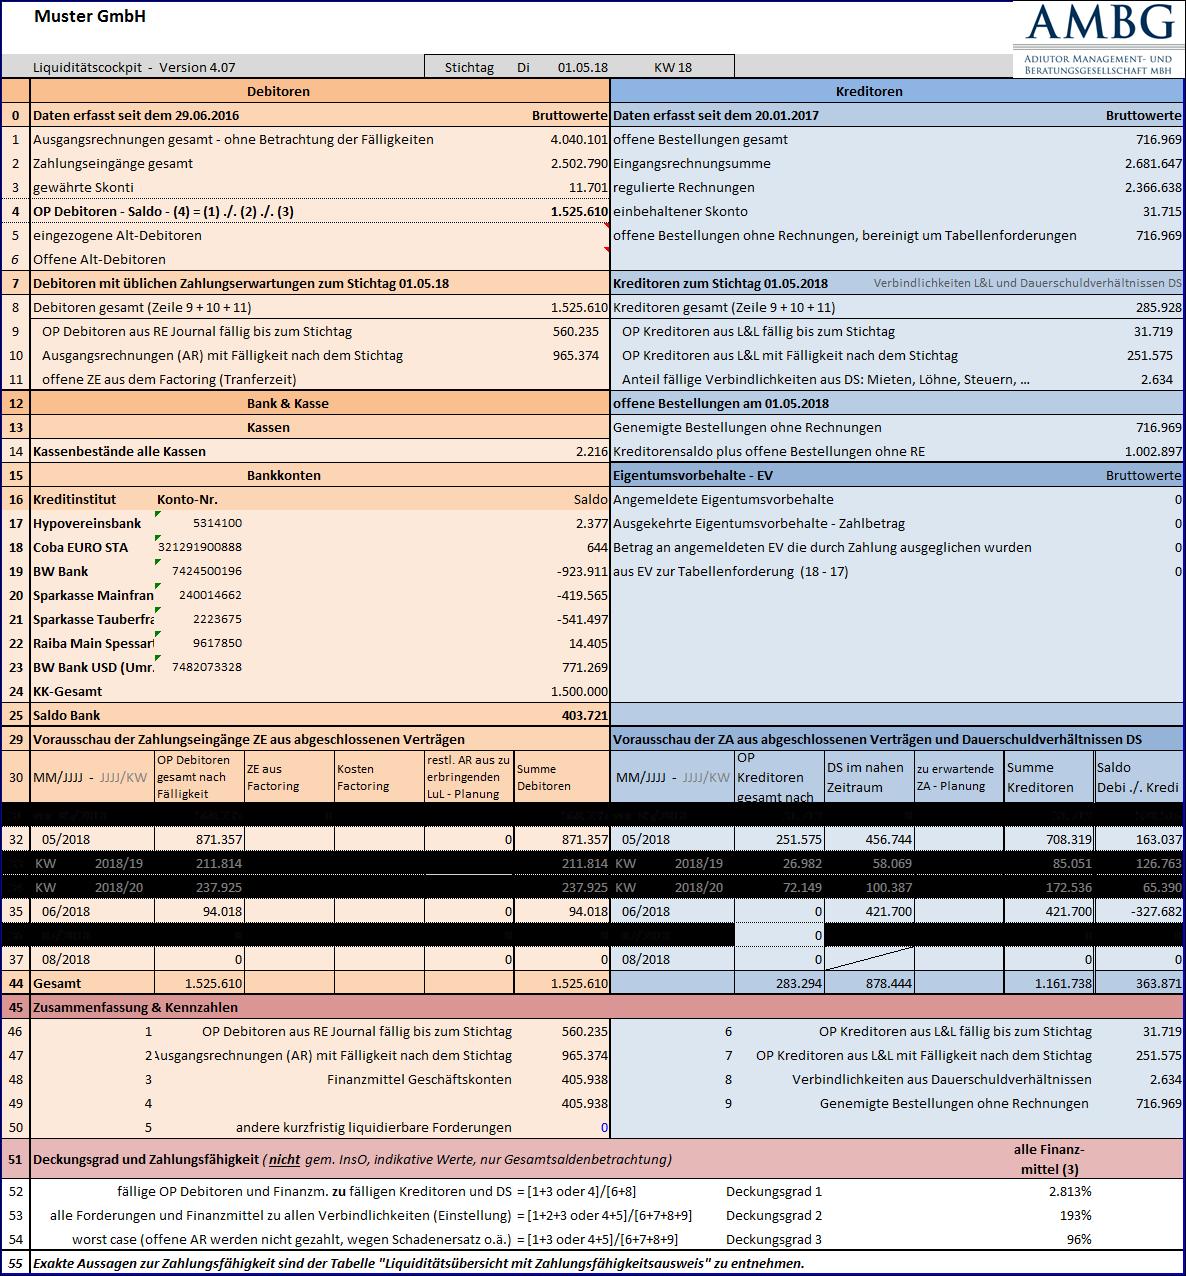 Musteransicht: Liquiditätscontrolling-Cockpit